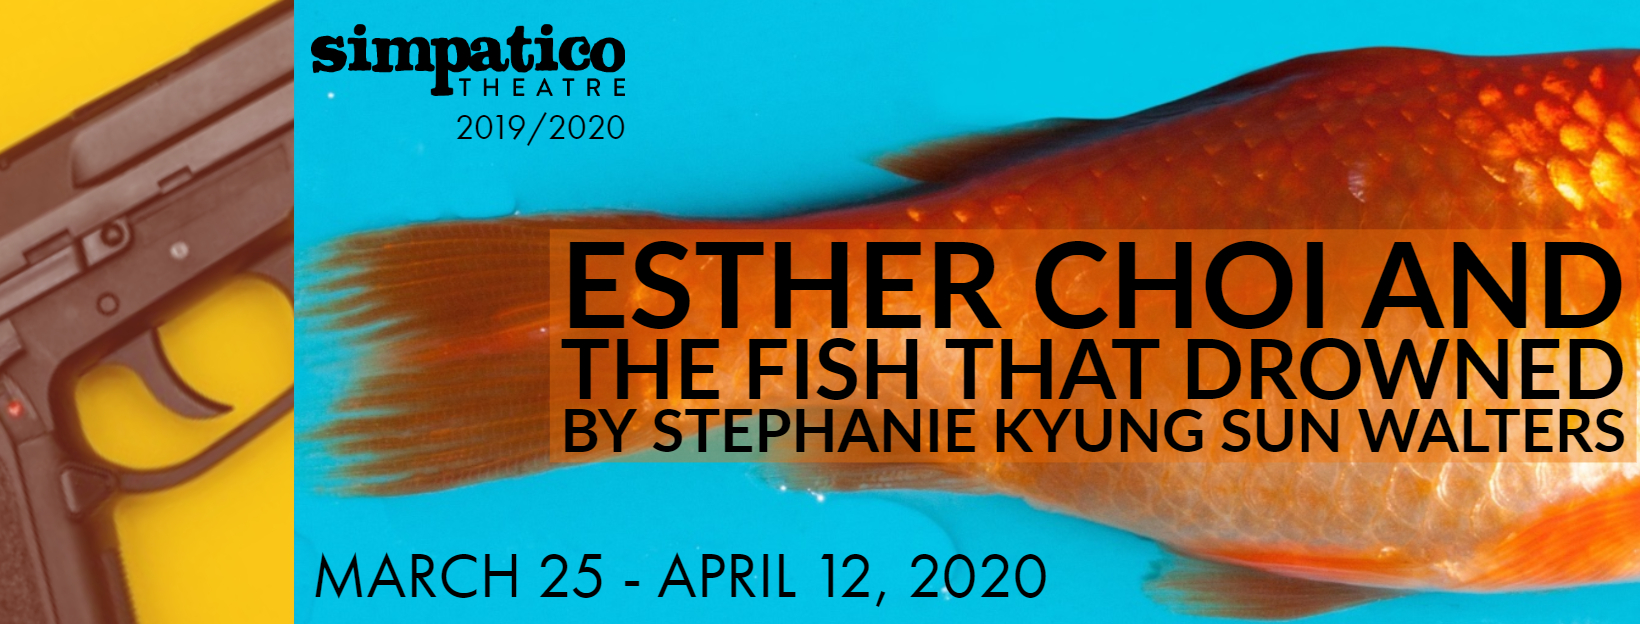 Esther1.jpg